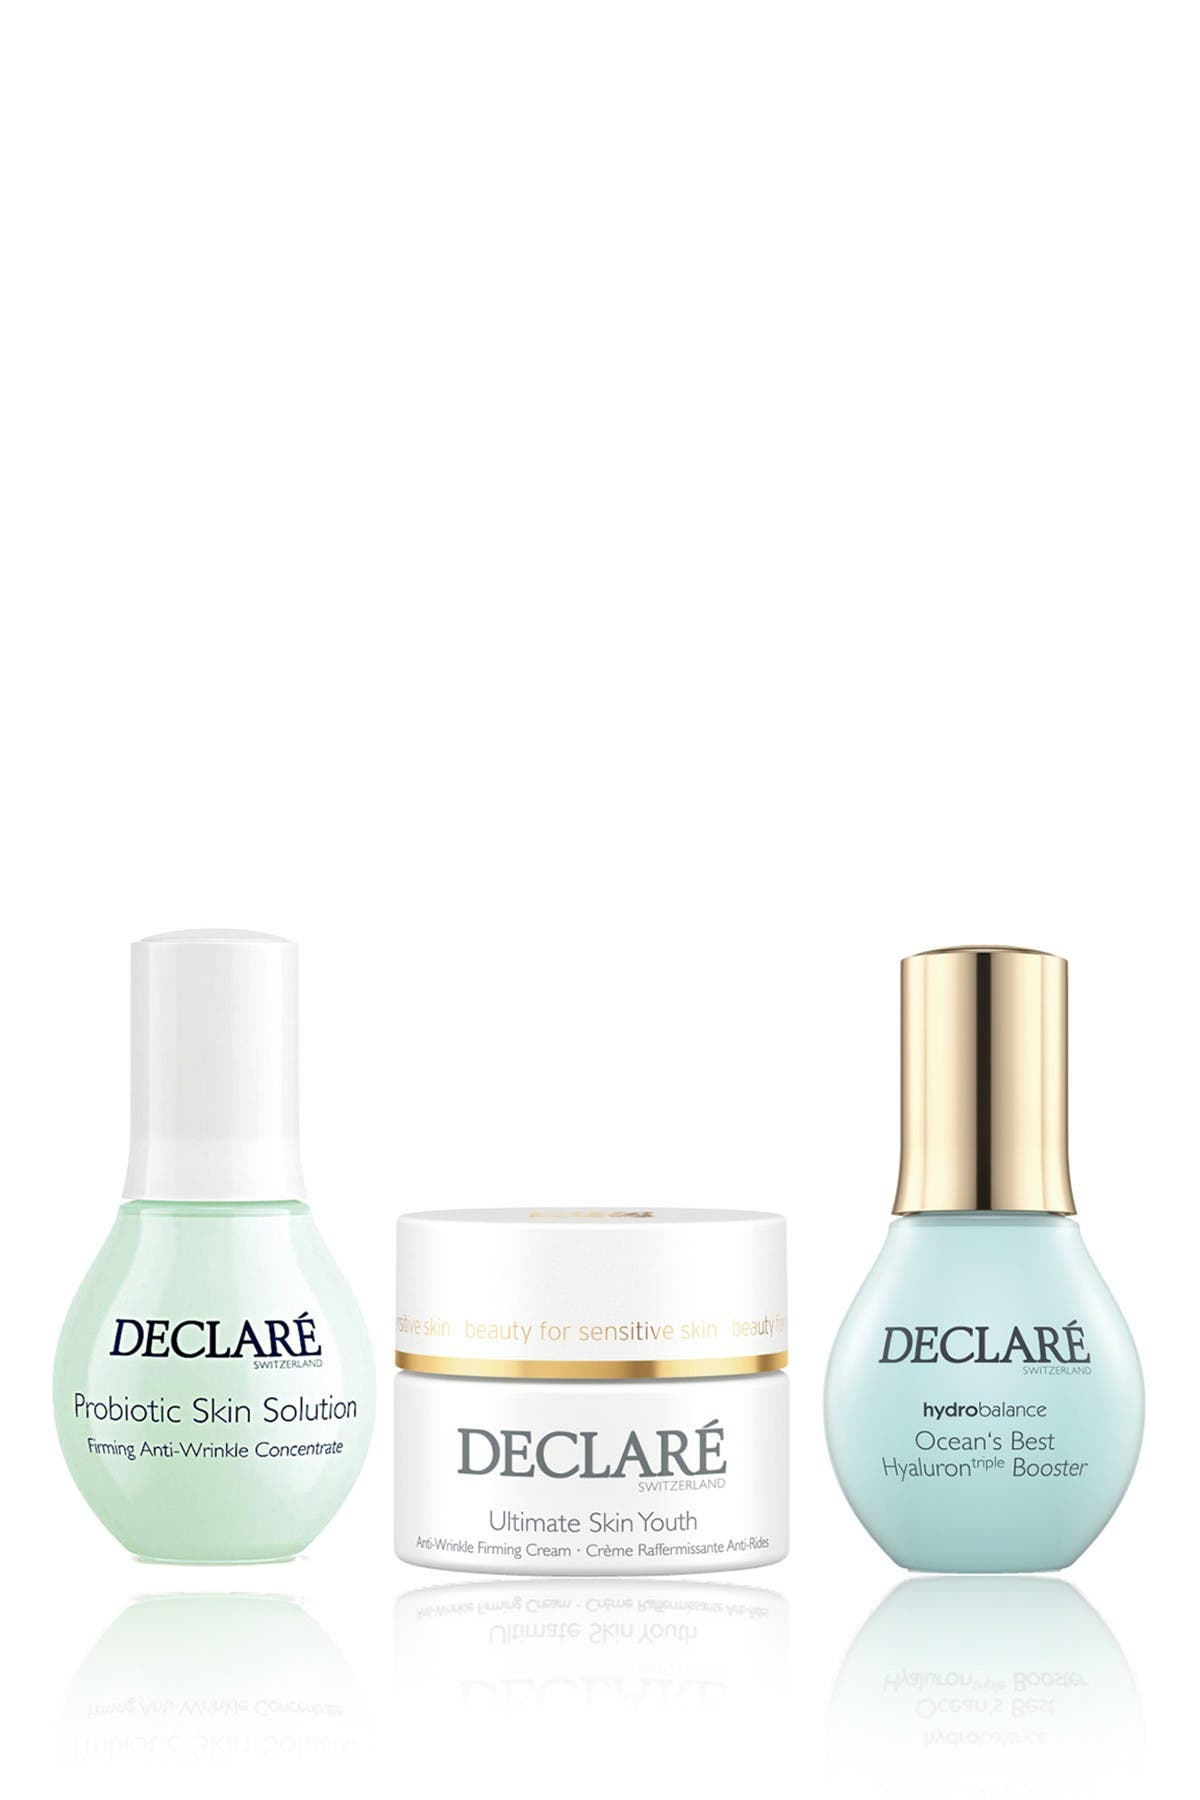 Image of DECLARE Anti-Wrinkle 3-Piece Skincare Set